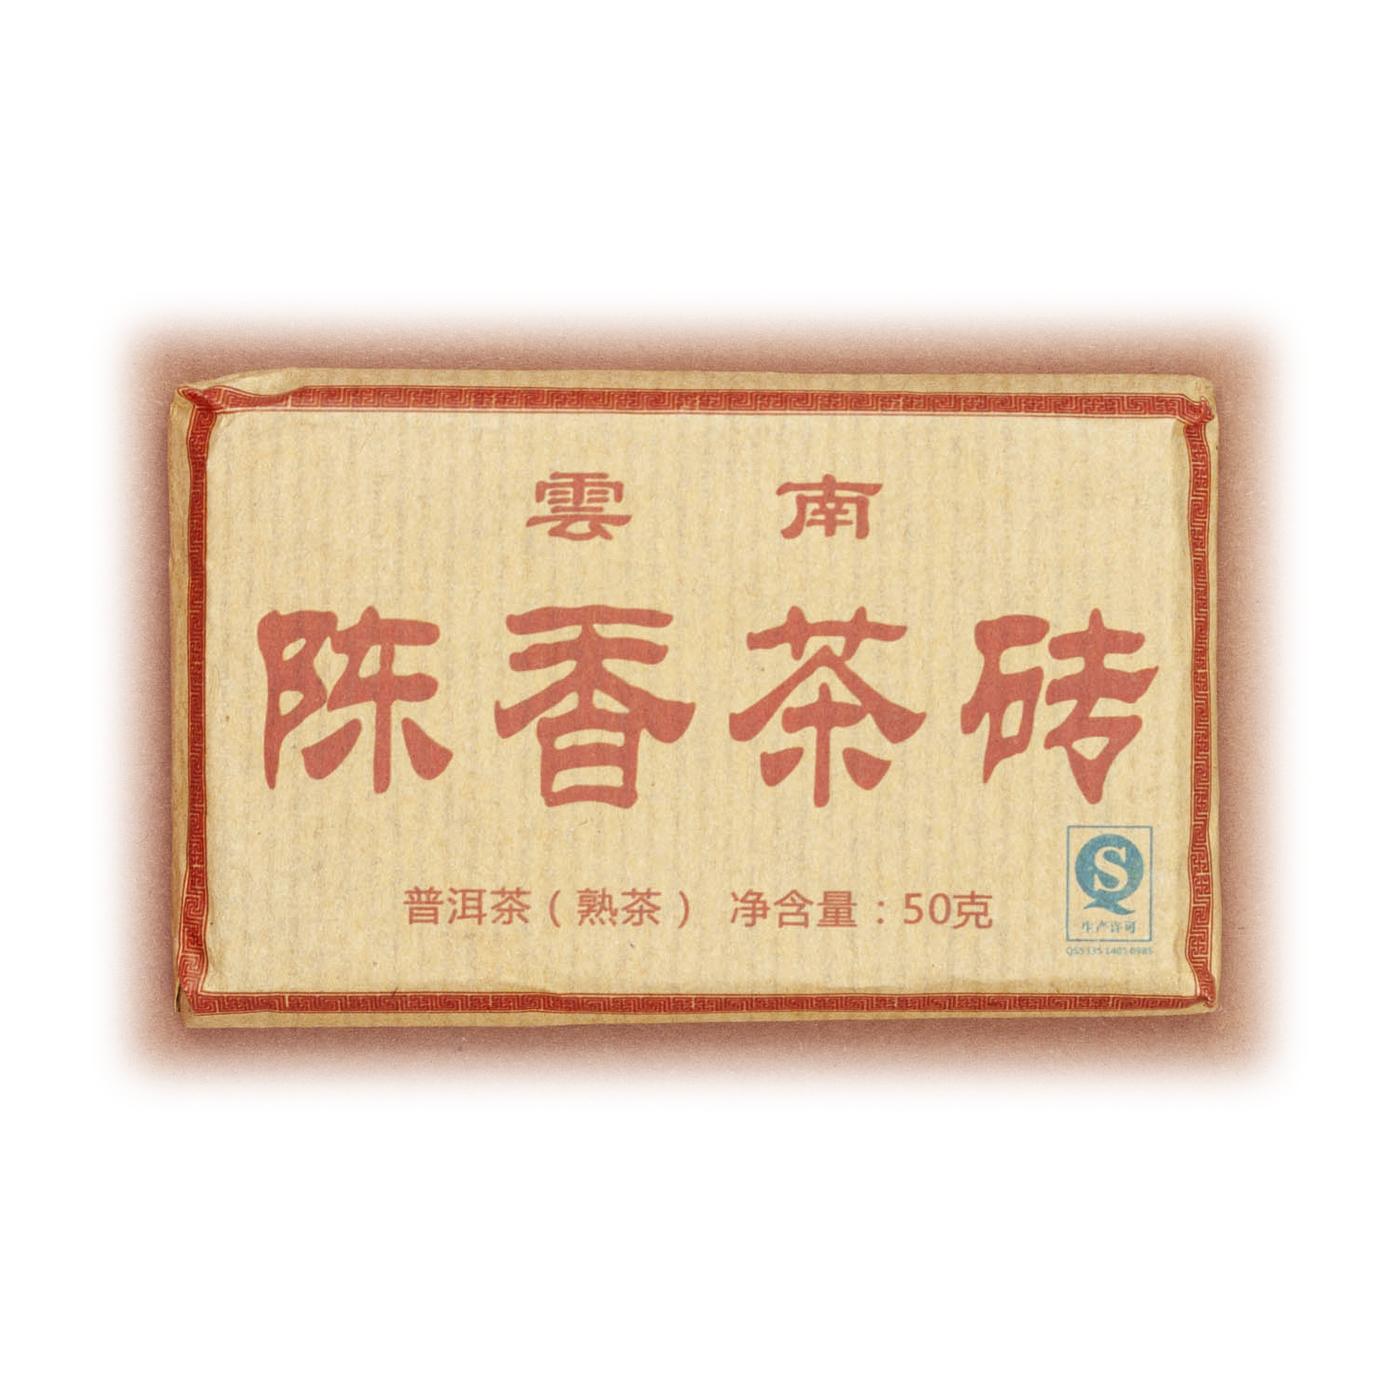 Чай шу пуэр 2010г прессованный 50г, Белая Обезьяна